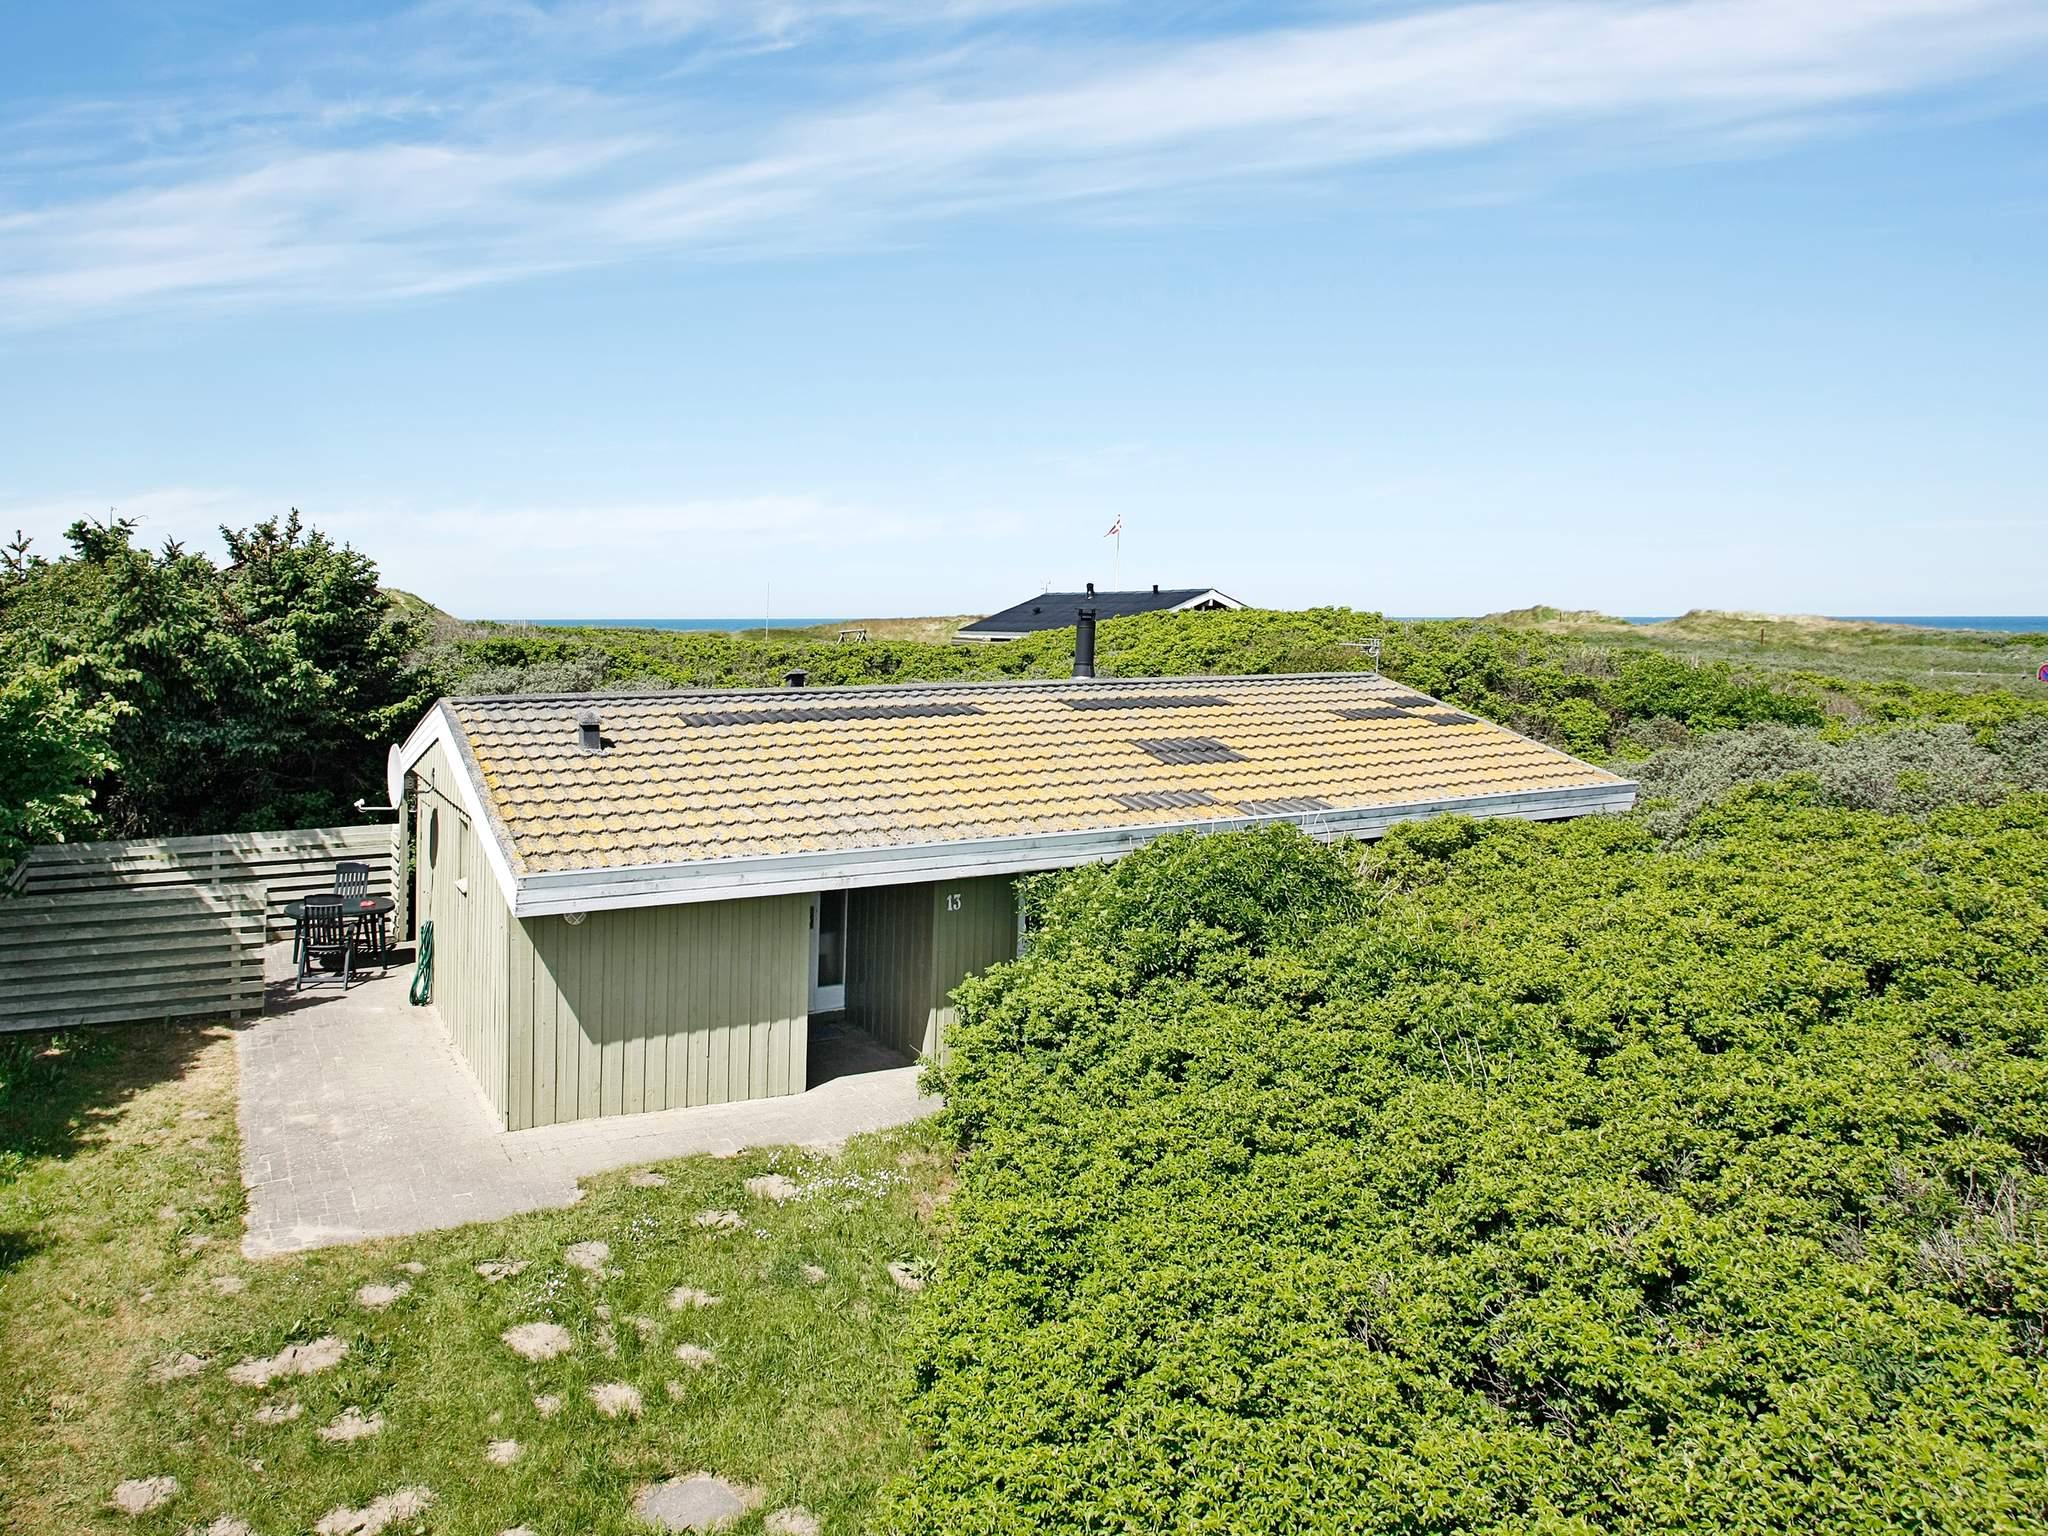 Ferienhaus Nr. Lyngby (89563), Løkken, , Nordwestjütland, Dänemark, Bild 1